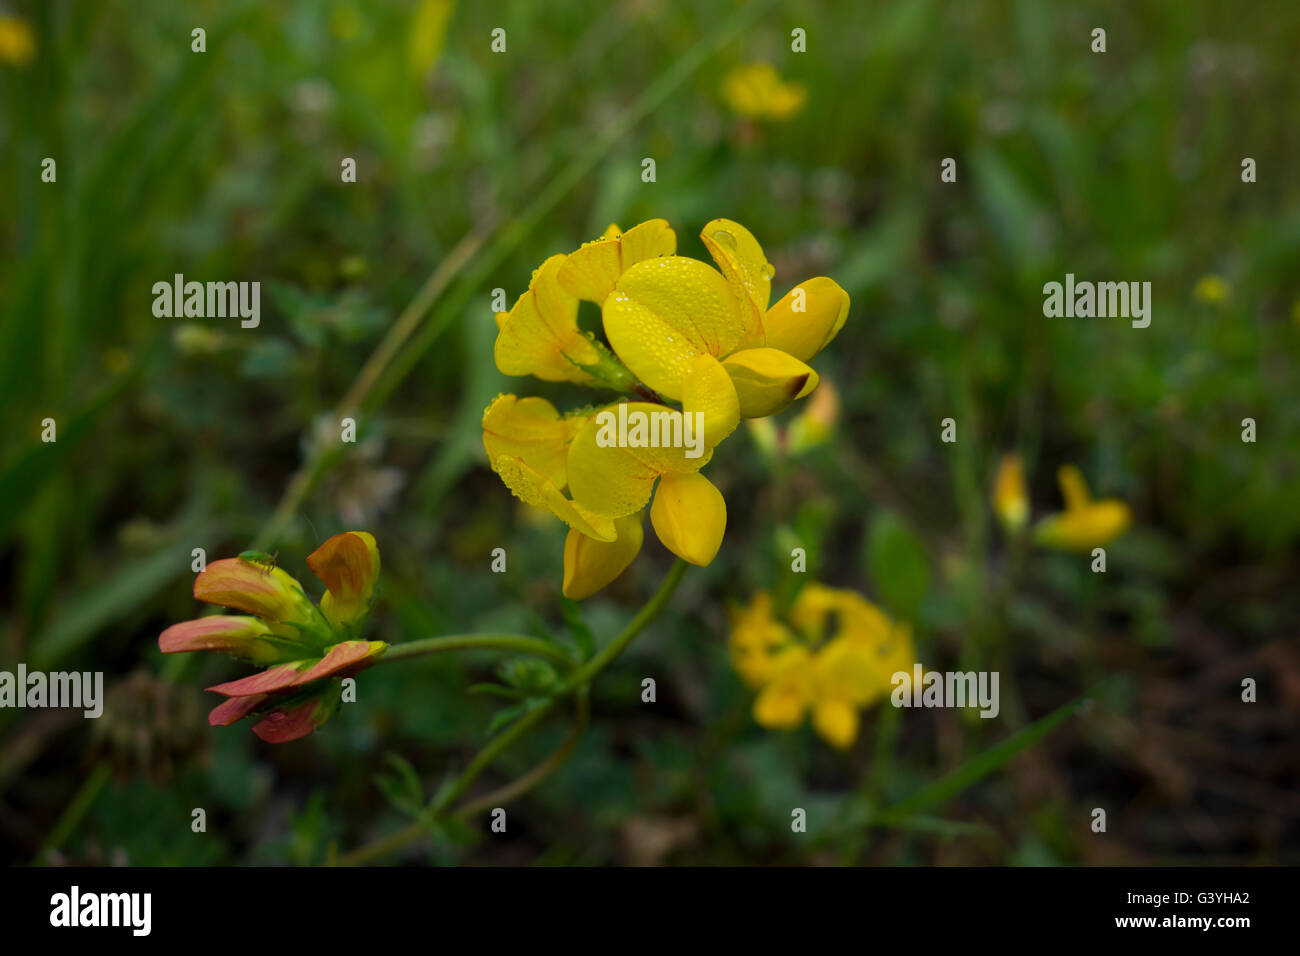 Bird's foot trefoil, Lotus corniculatus, a common field flower of Europe. - Stock Image